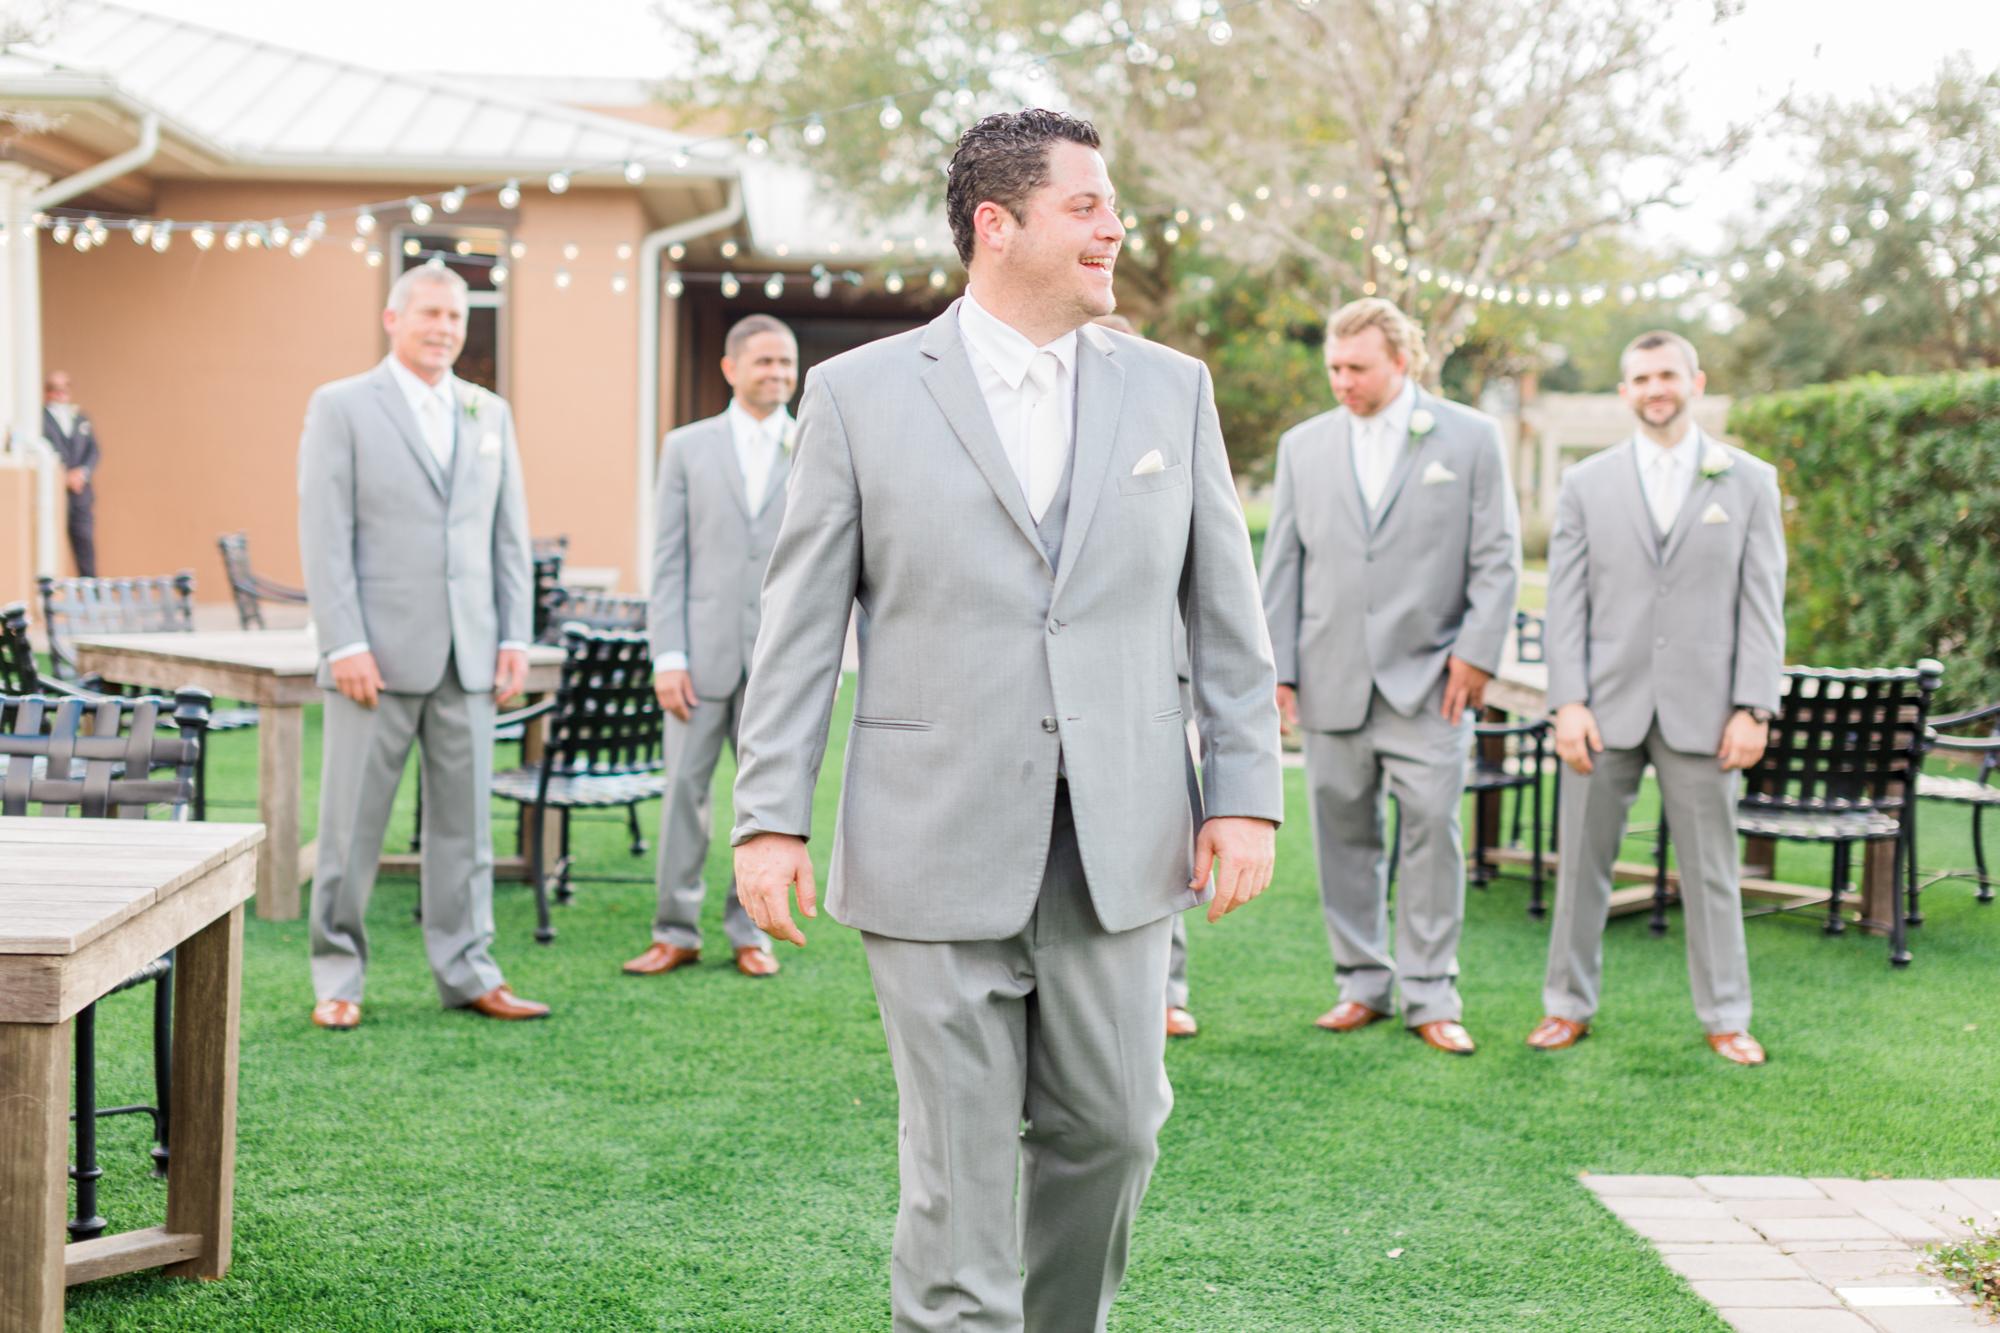 jessica-bellinger-photography-harmony-golf-preserve-wedding-photos-8715.jpg